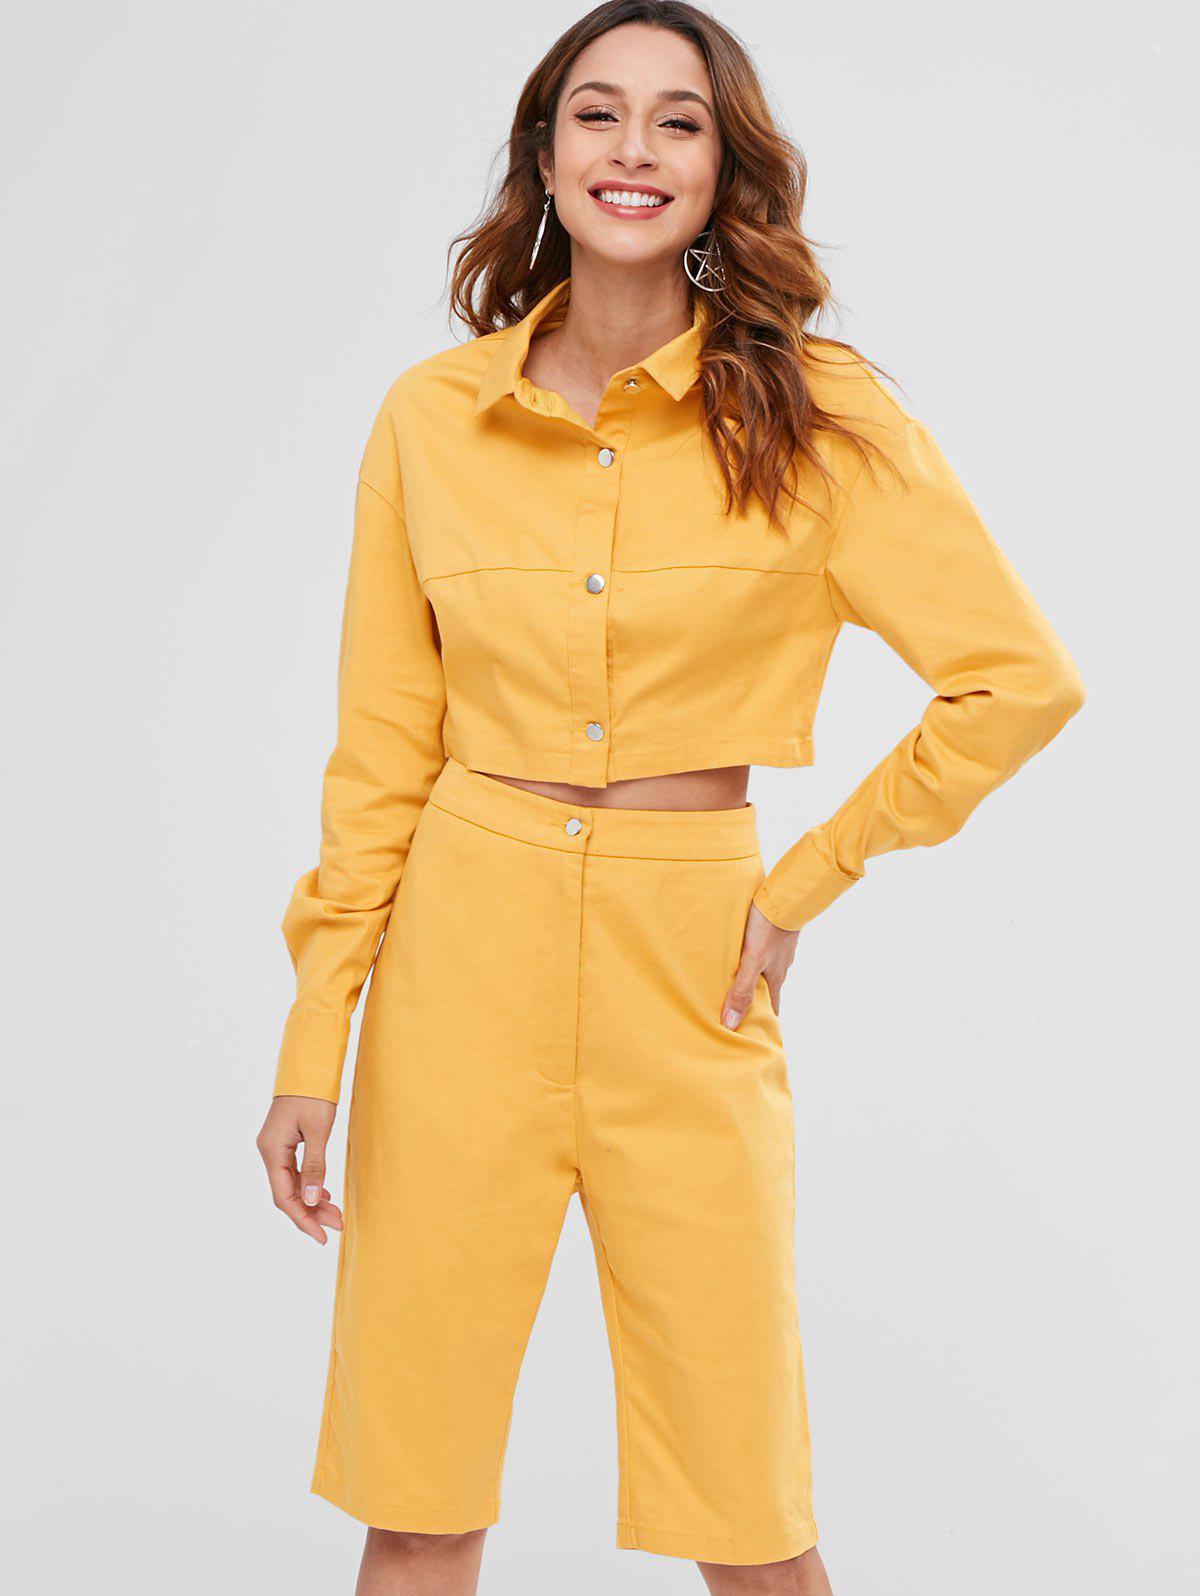 ZAFUL Buttoned Crop Shirt and Shorts Set, Mustard